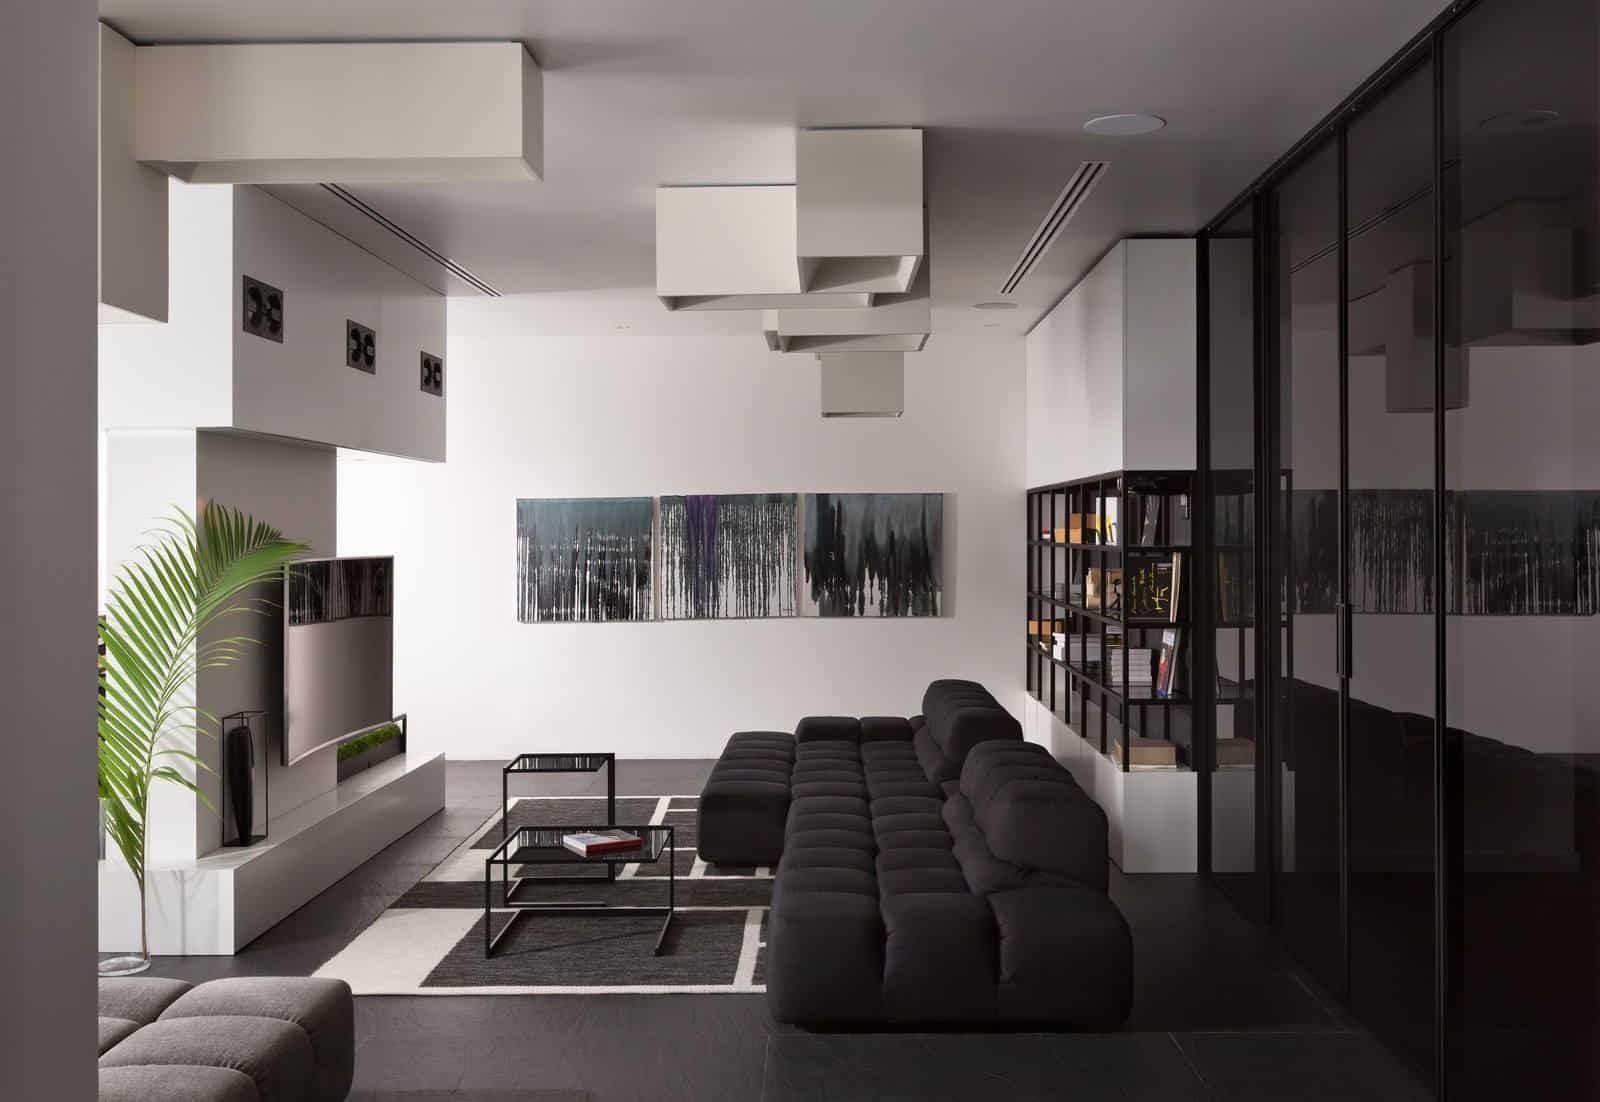 thiet-ke-noi-that-chung-cu-mai-dich-9 Thiết kế nội thất chung cư Mai Dịch - A. Sinh